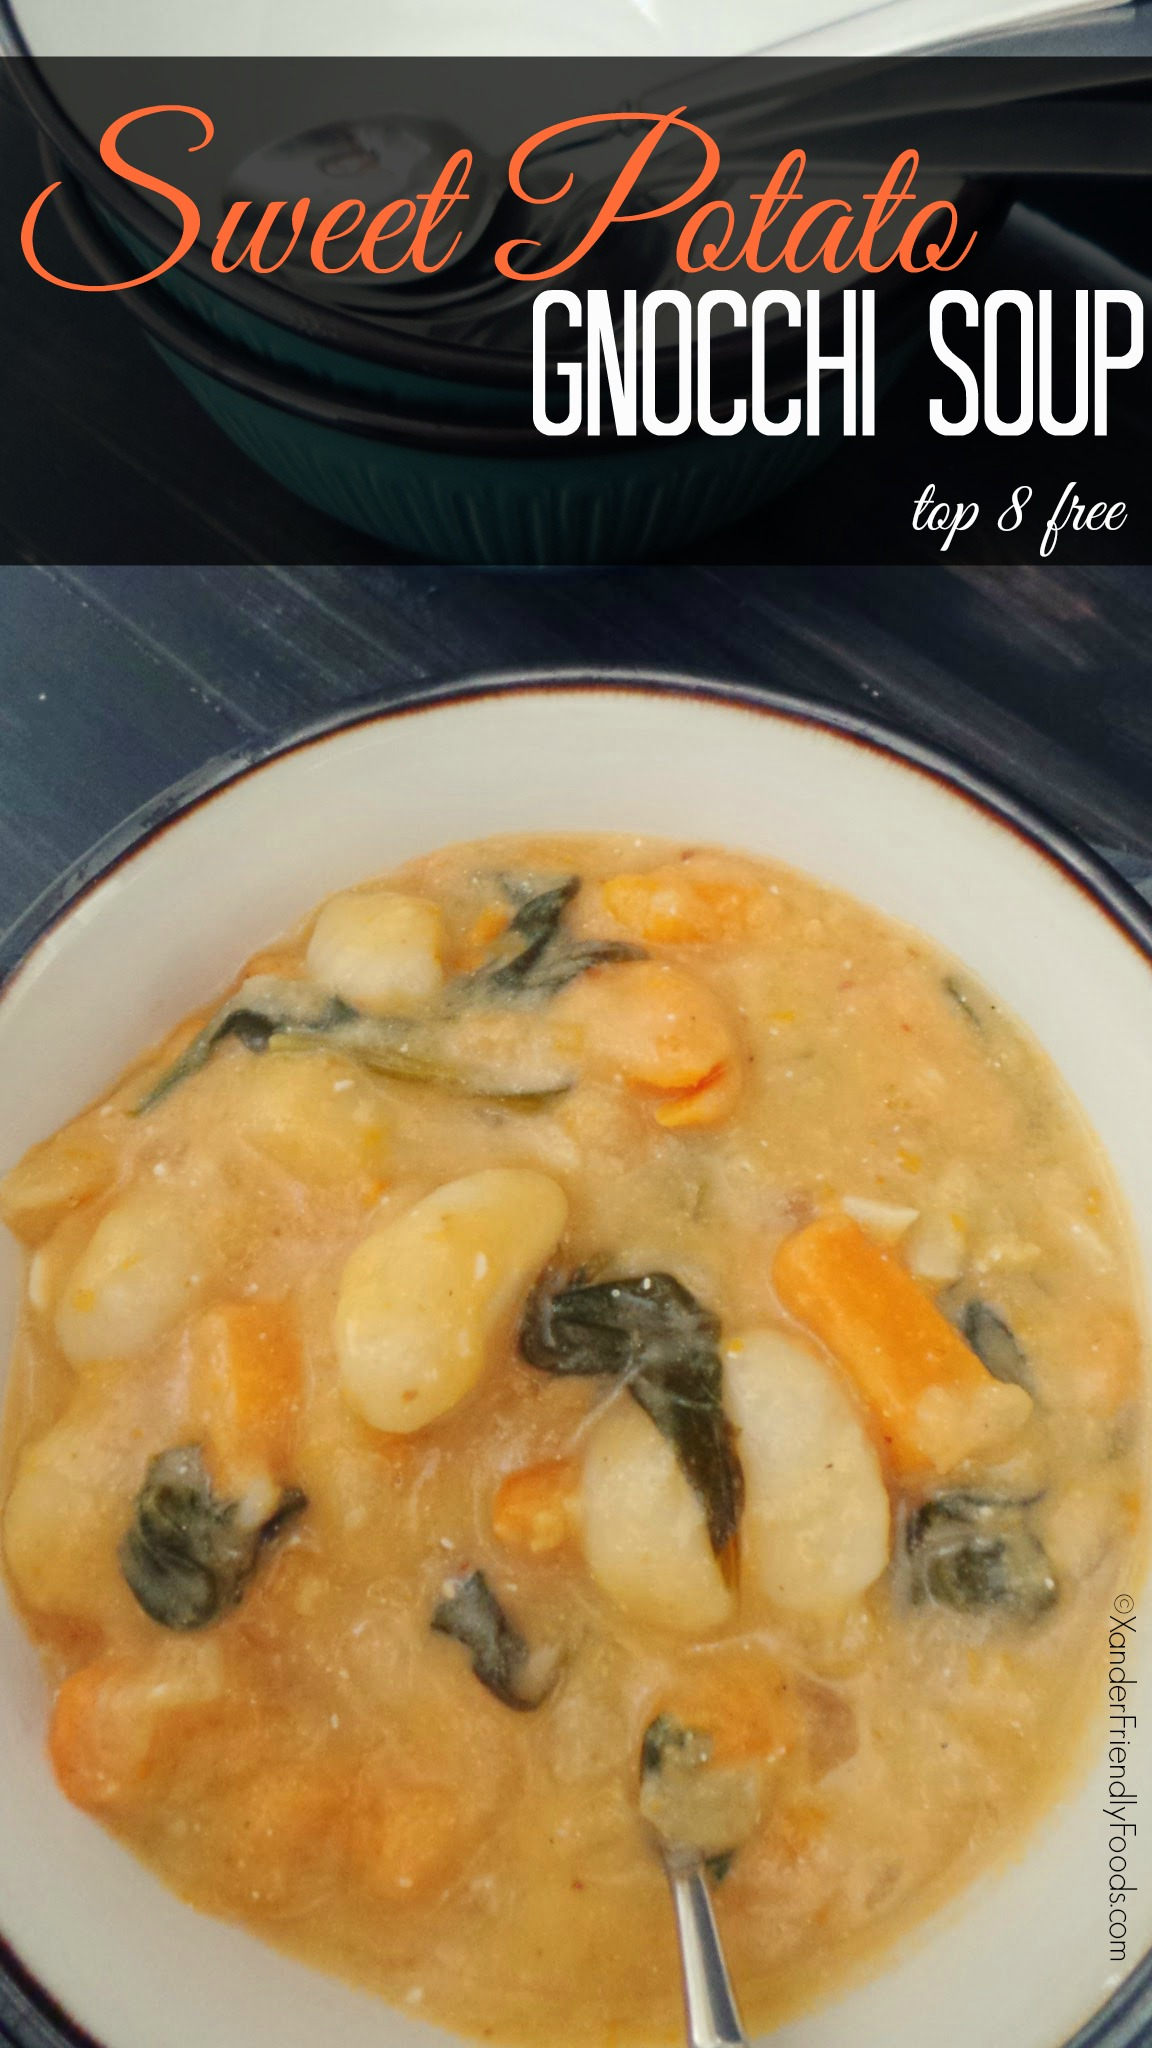 Sweet Pot Gnocchi Blog